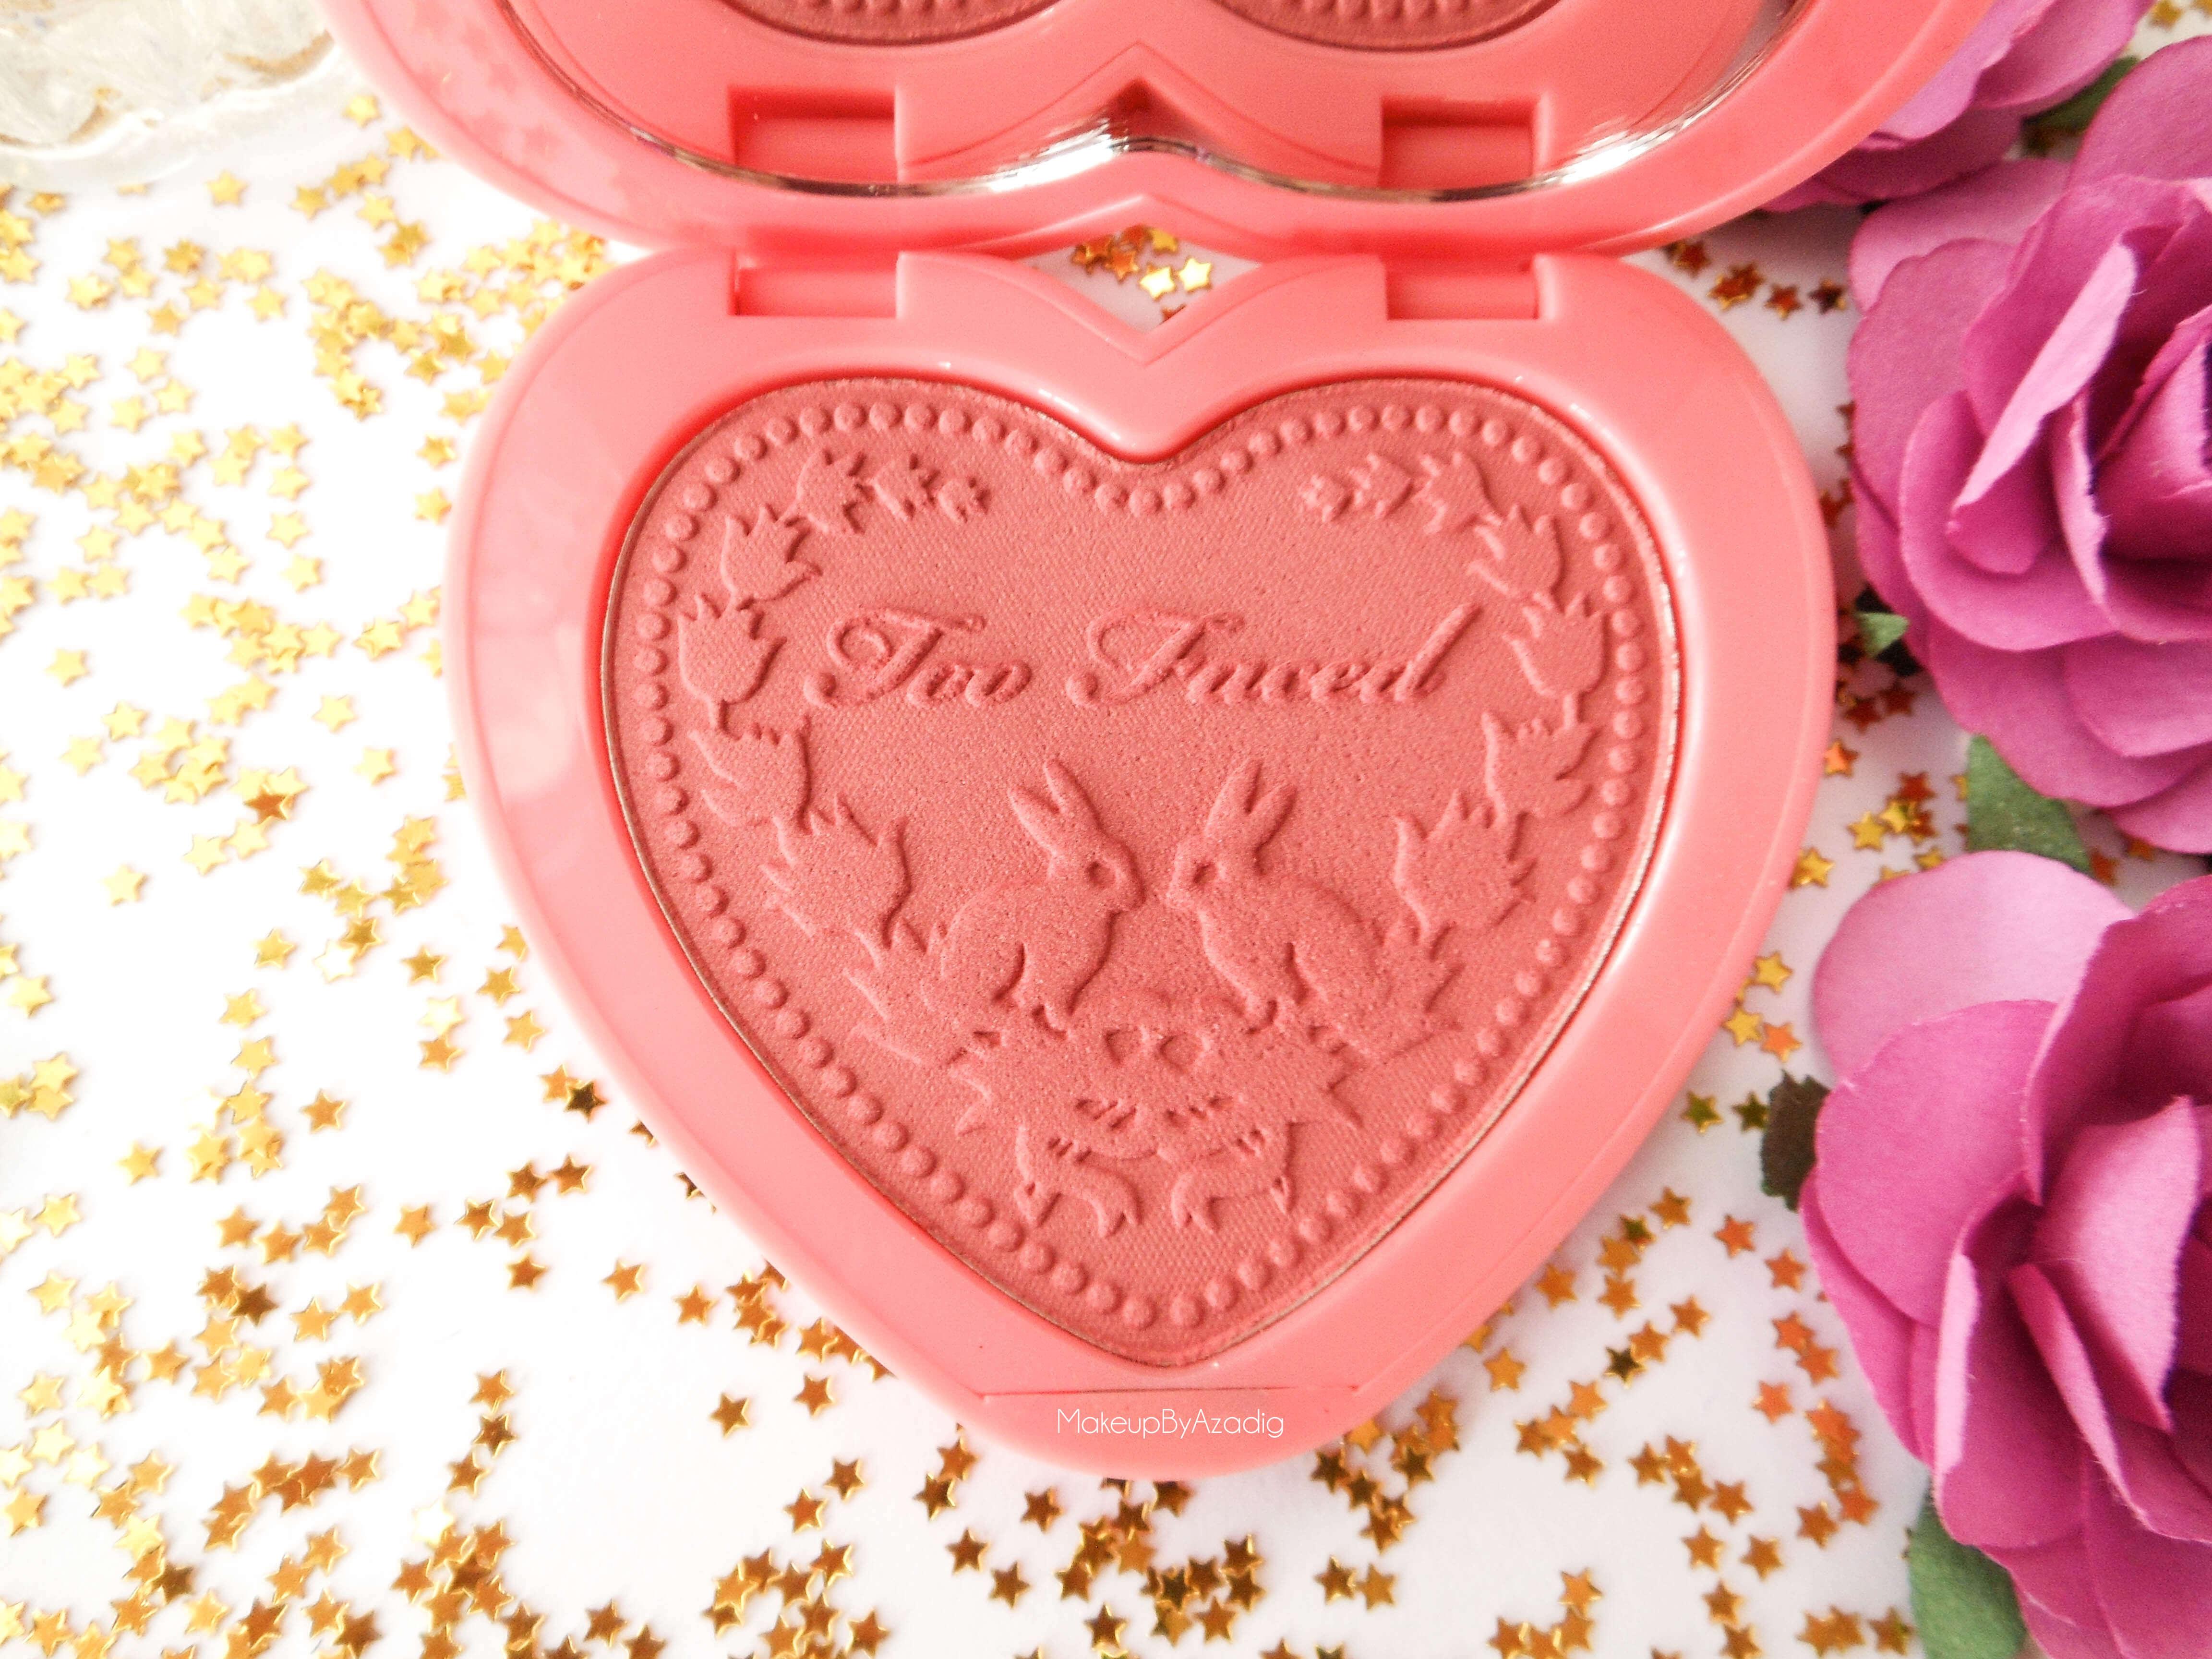 makeupbyazadig-love-flush-blush-too-faced-love-hangover-blog-influencer-sephora-france-corail